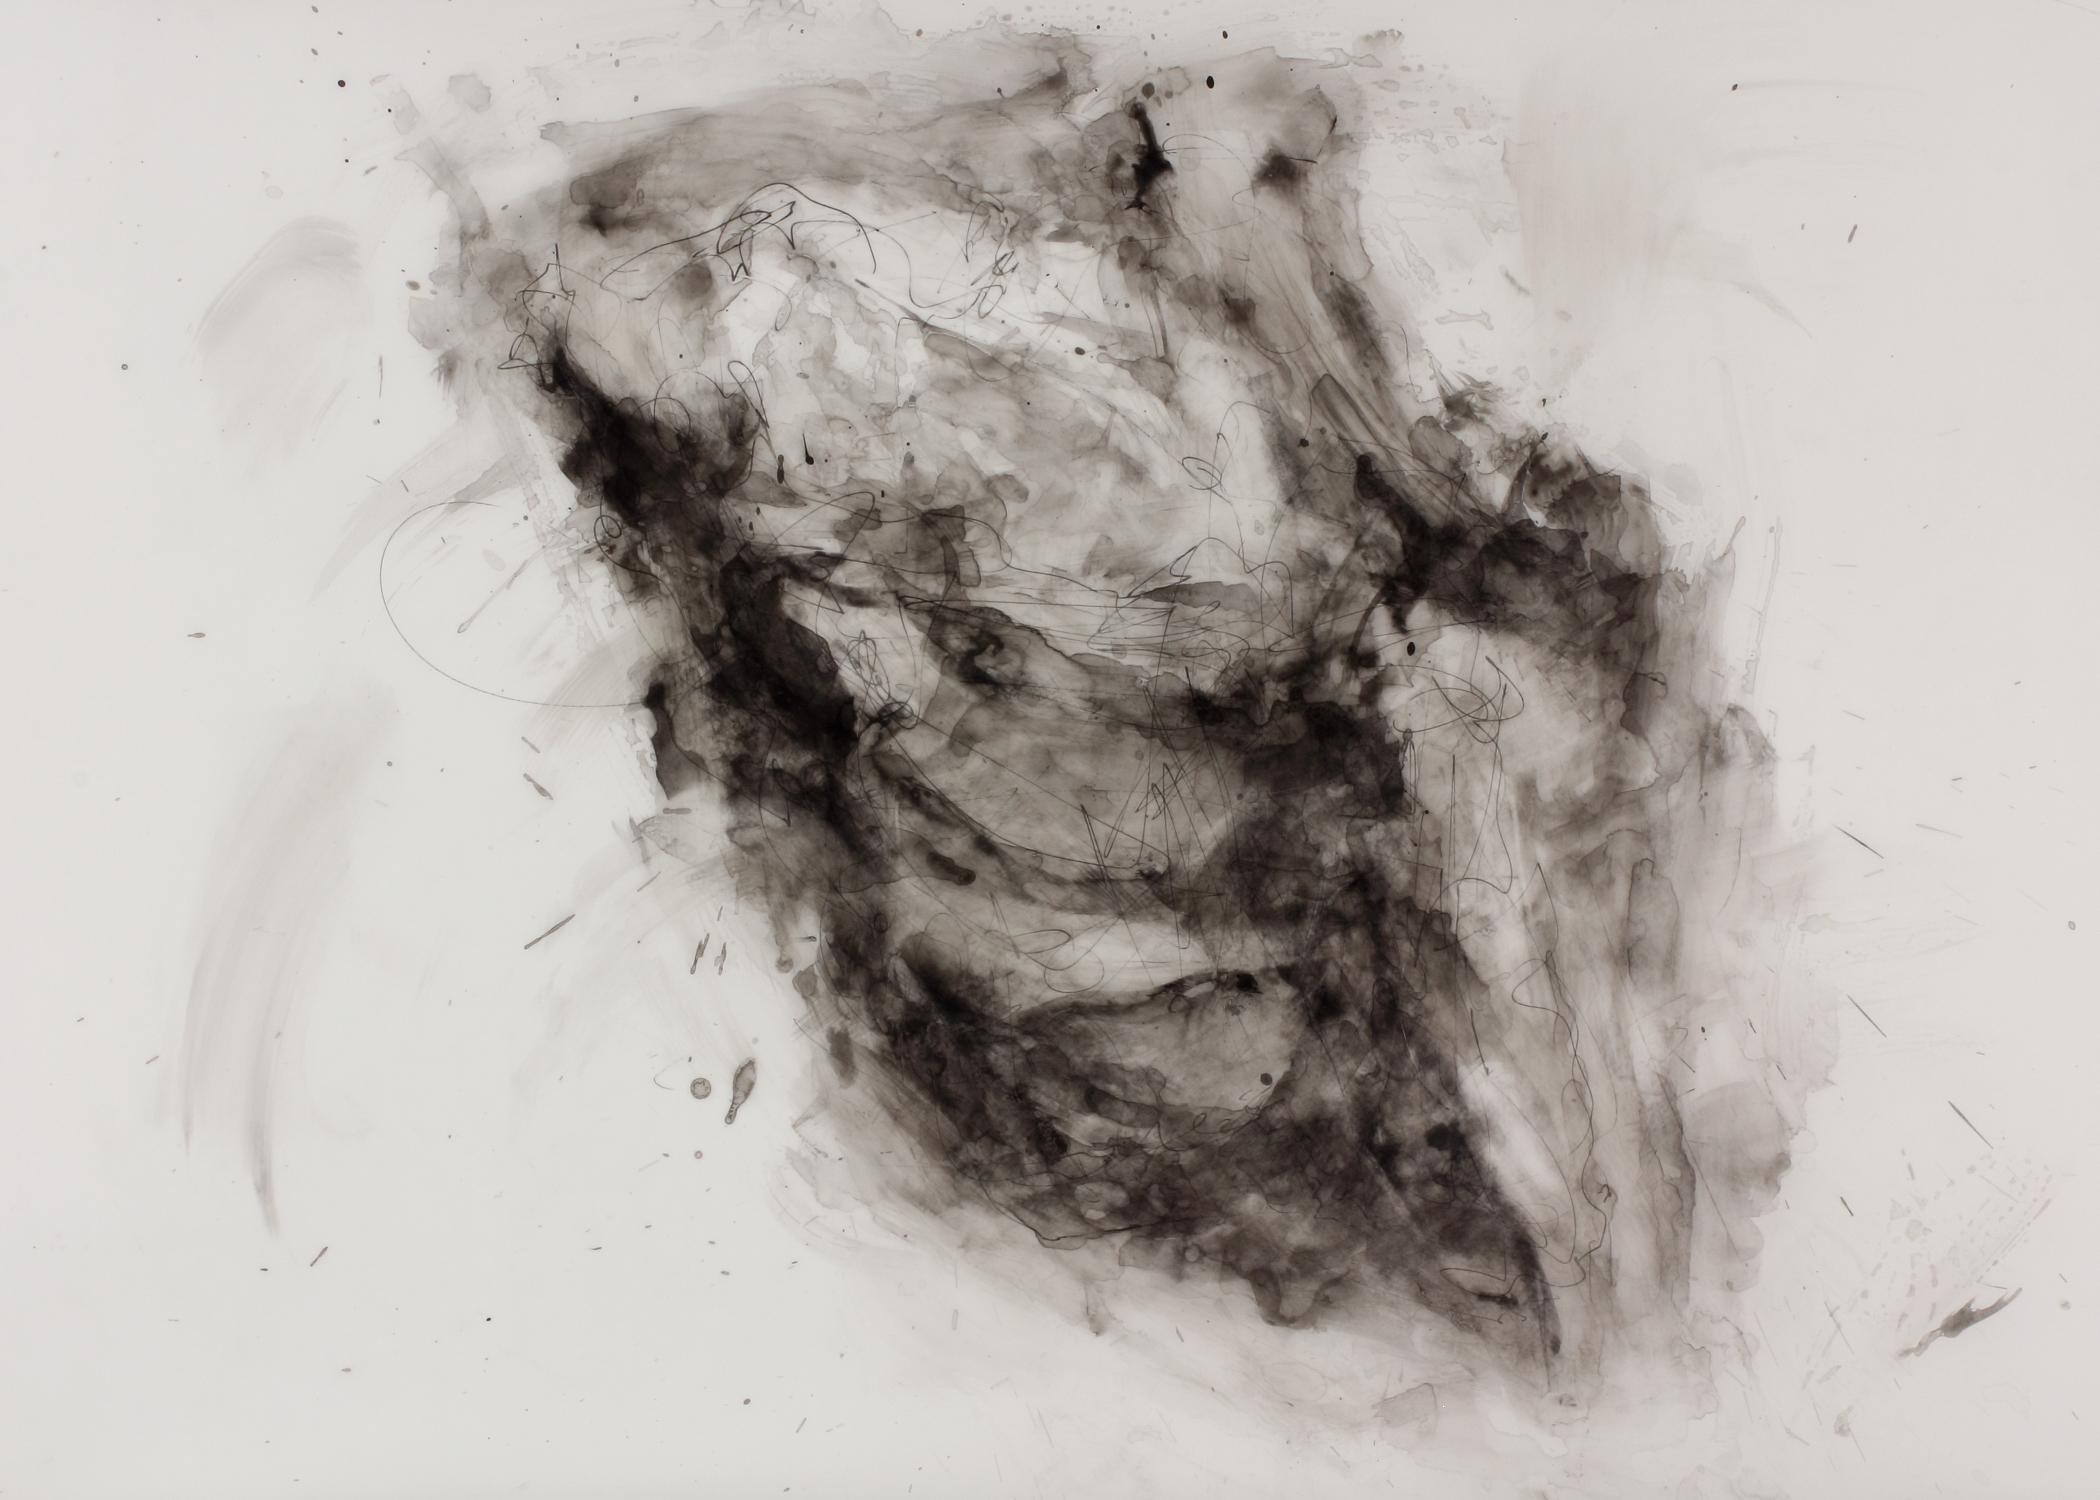 Lump of Coal (1).jpg